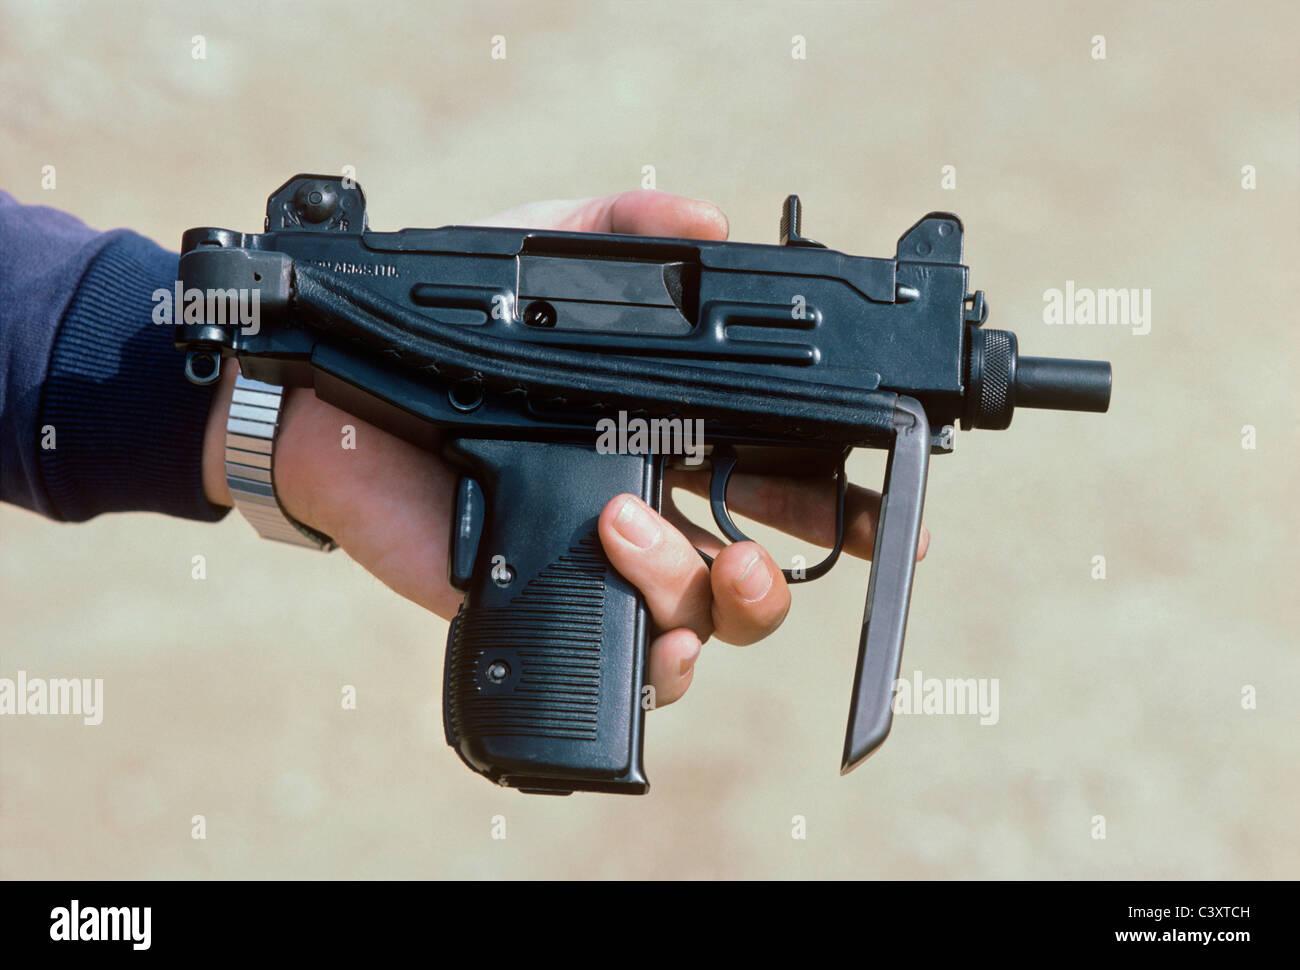 IMI Micro Uzi Submachine gun MAC-11 MAC-10, uzi, assault Rifle, airsoft png  | PNGEgg